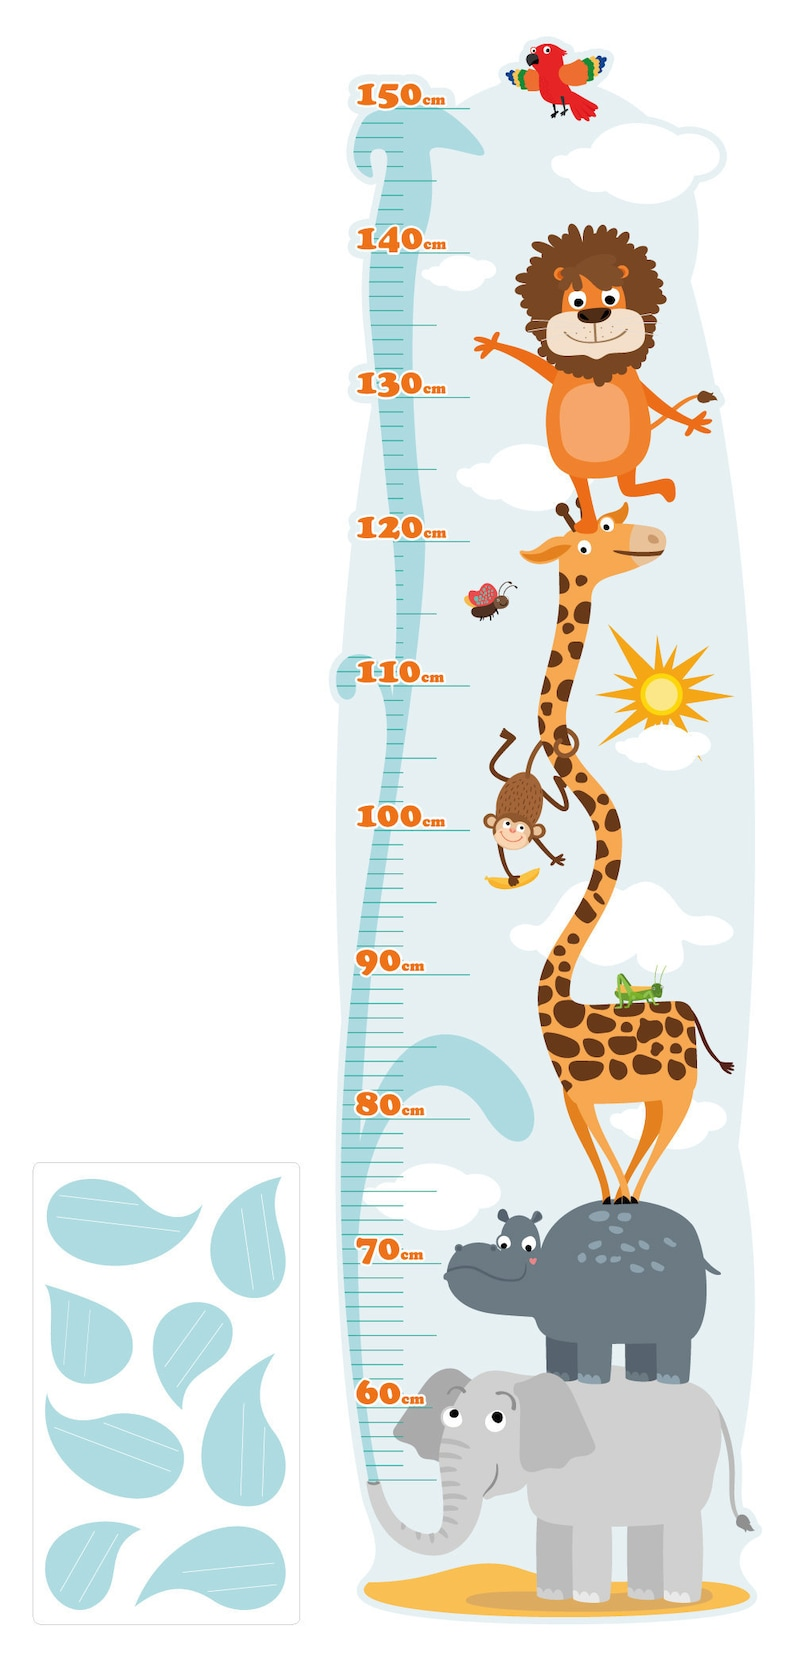 Wandtattoo Kinderzimmer Messlatte Safari Messlatte